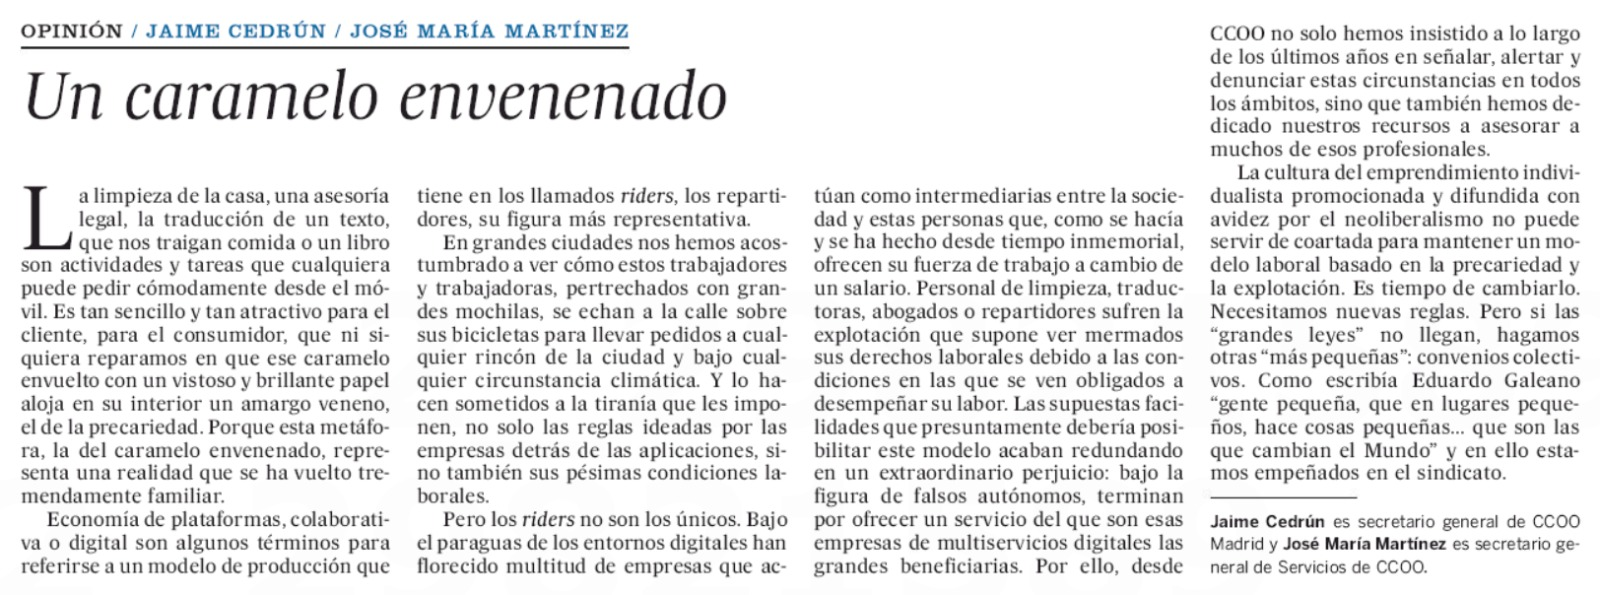 Tribuna El País